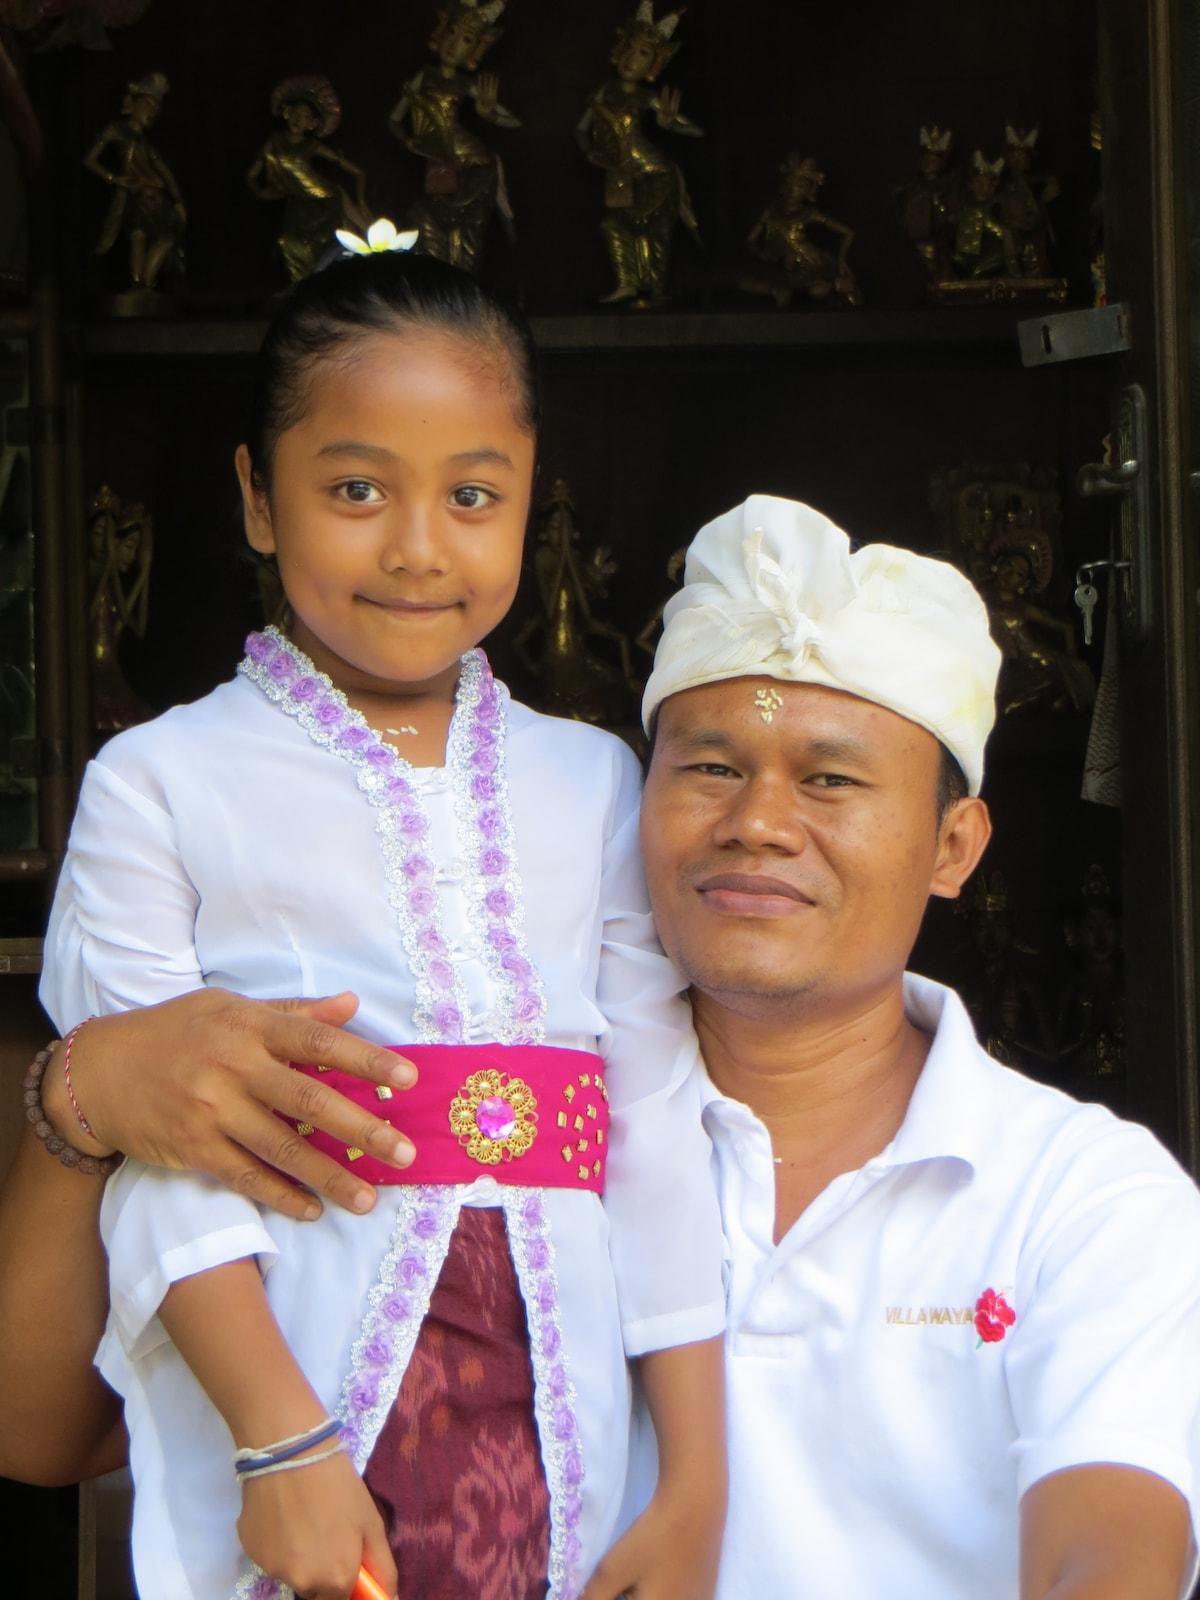 Gusti From Ubud, Indonesia